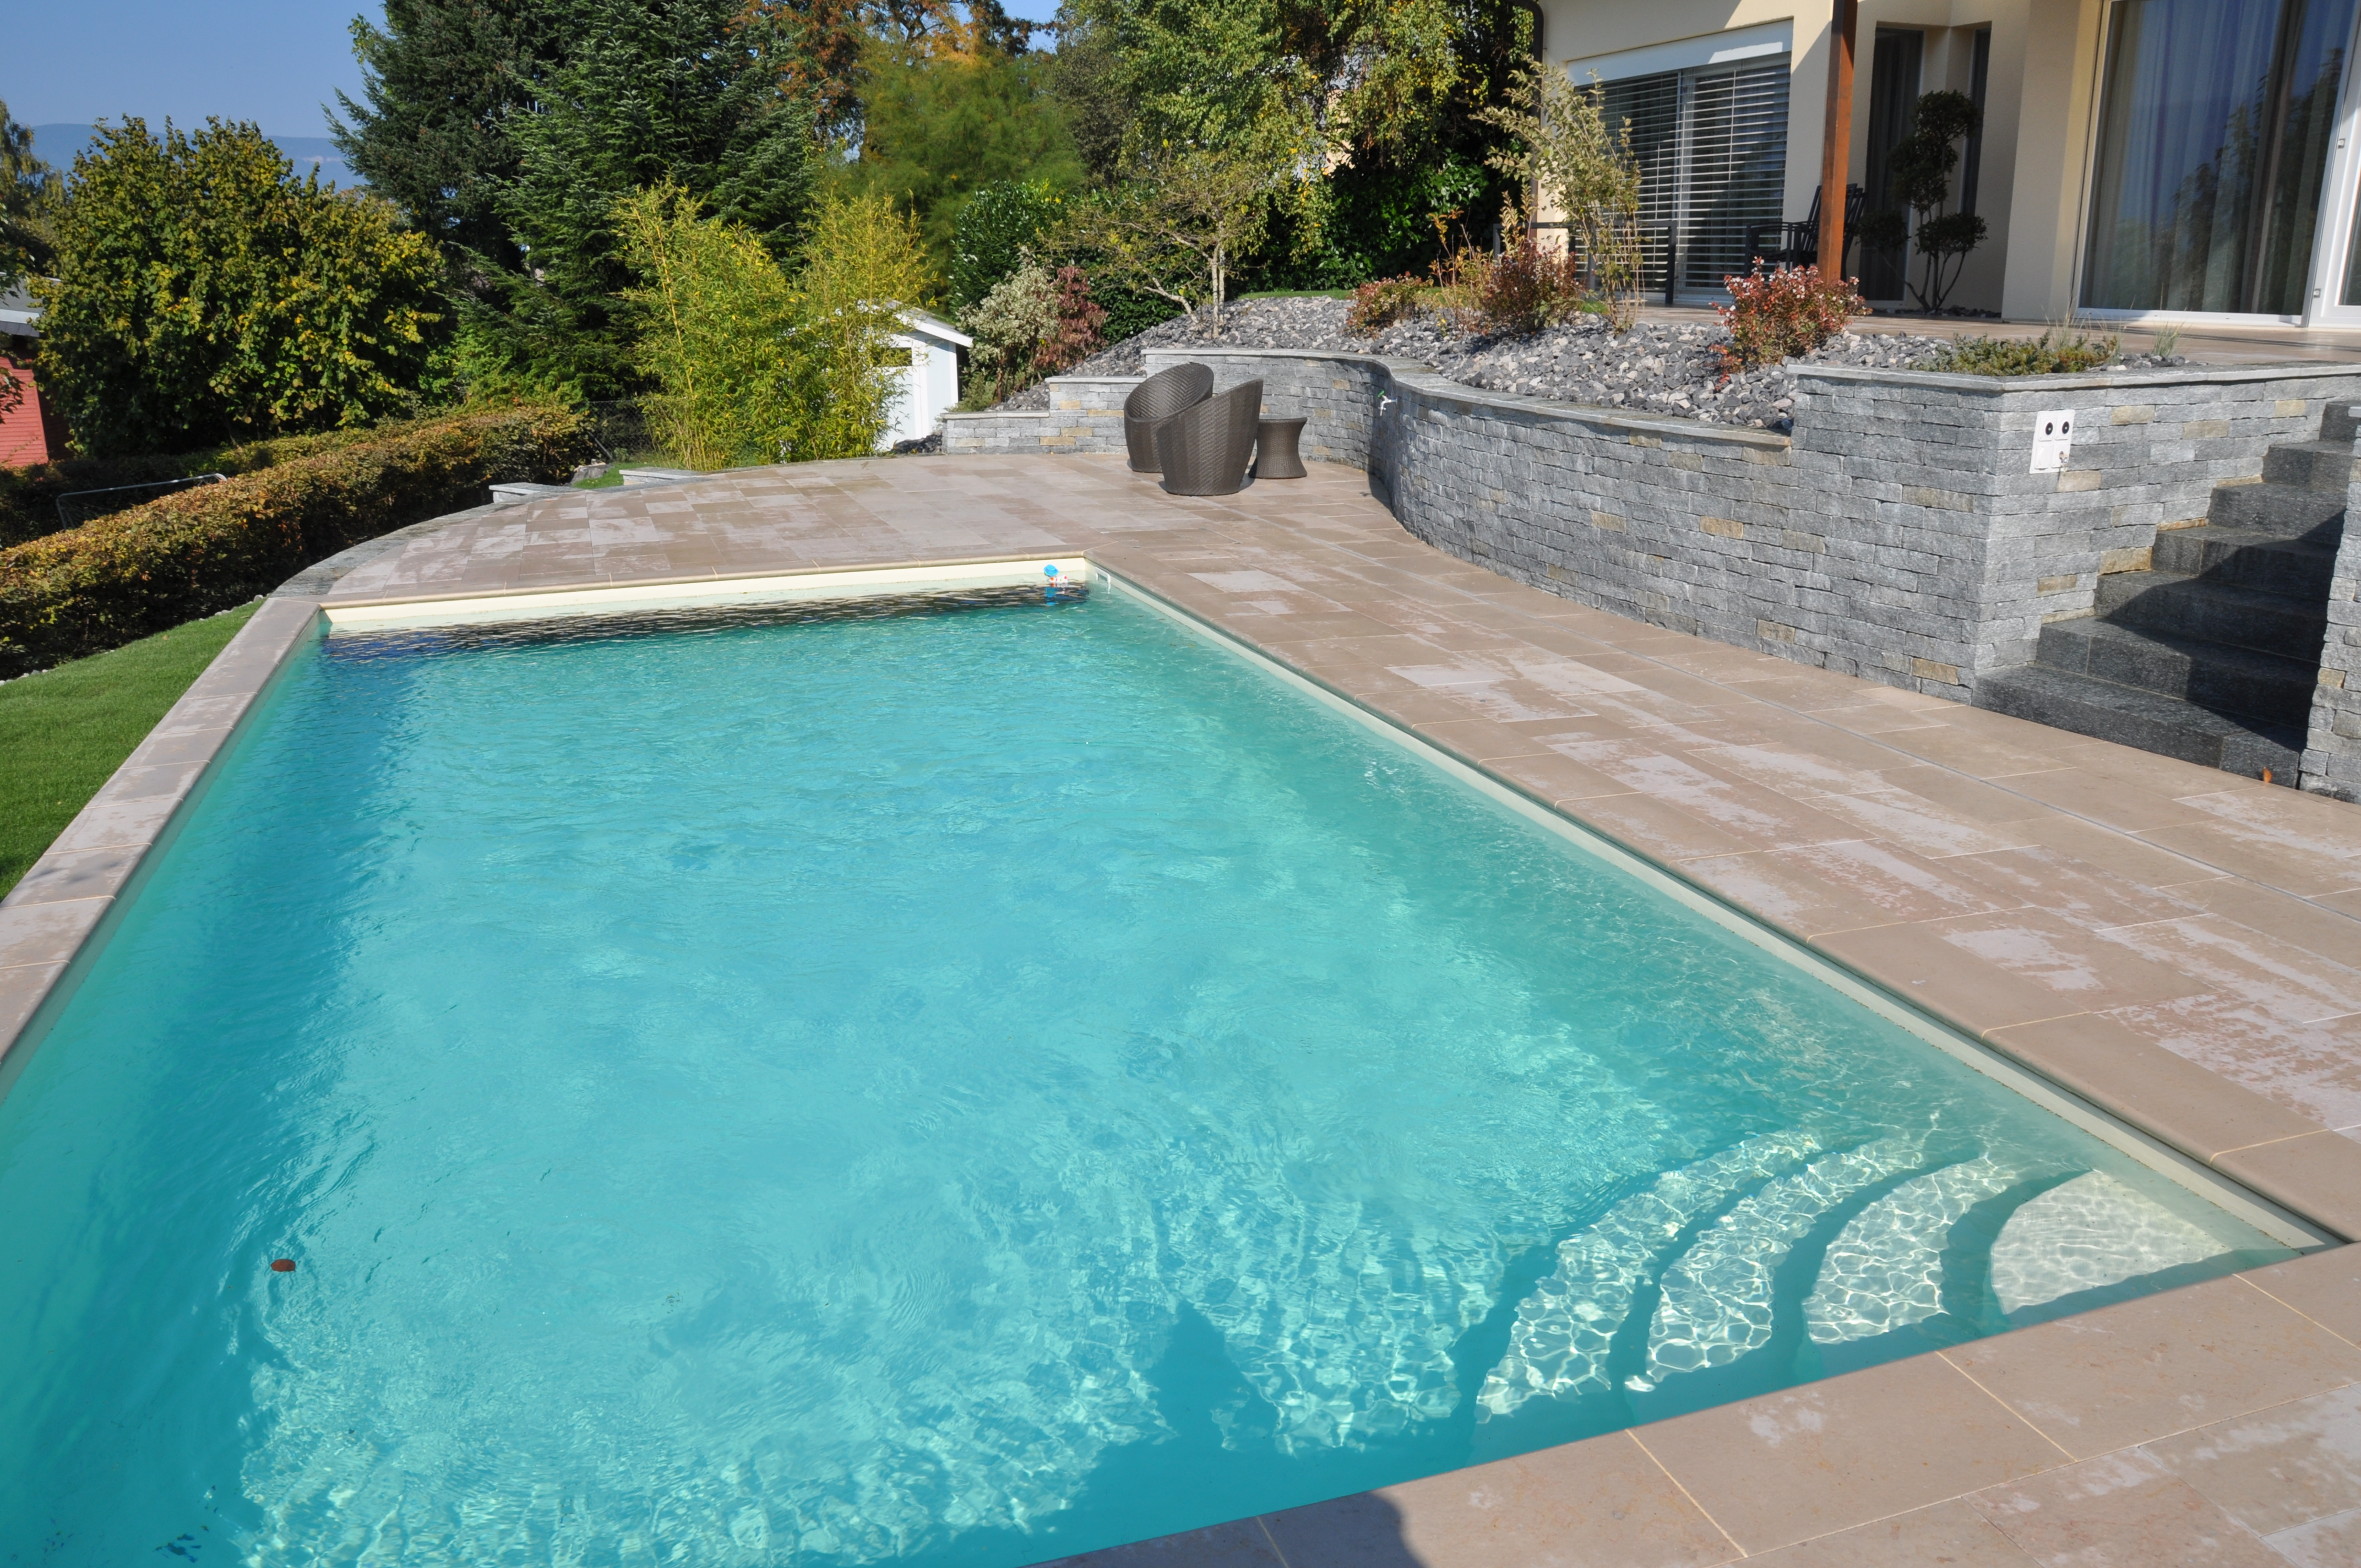 Piscine autoportante piscines bertrand for Piscine autoportante